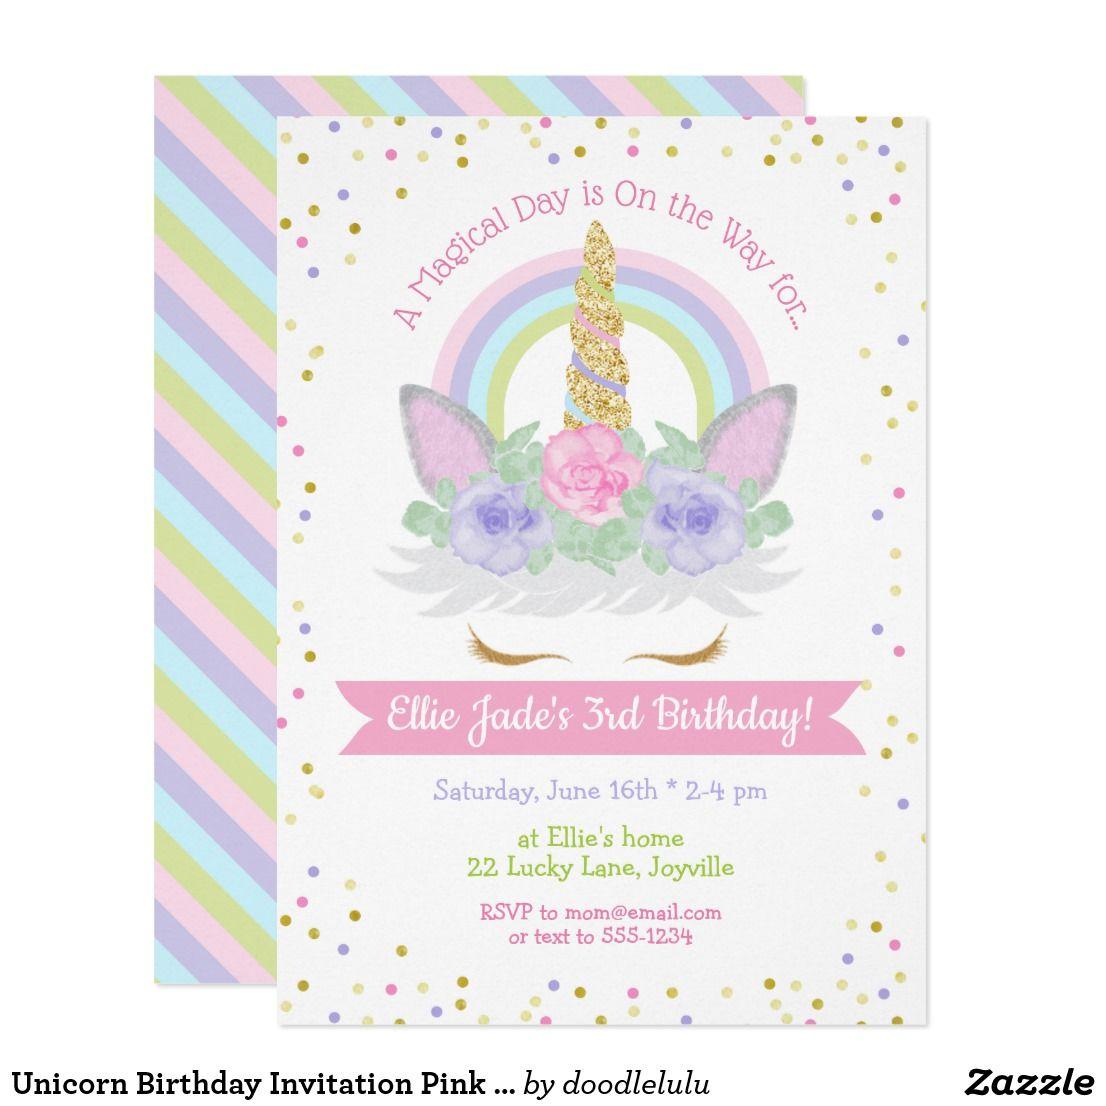 Unicorn Birthday Invitation Pink & Purple Rainbow Zazzle